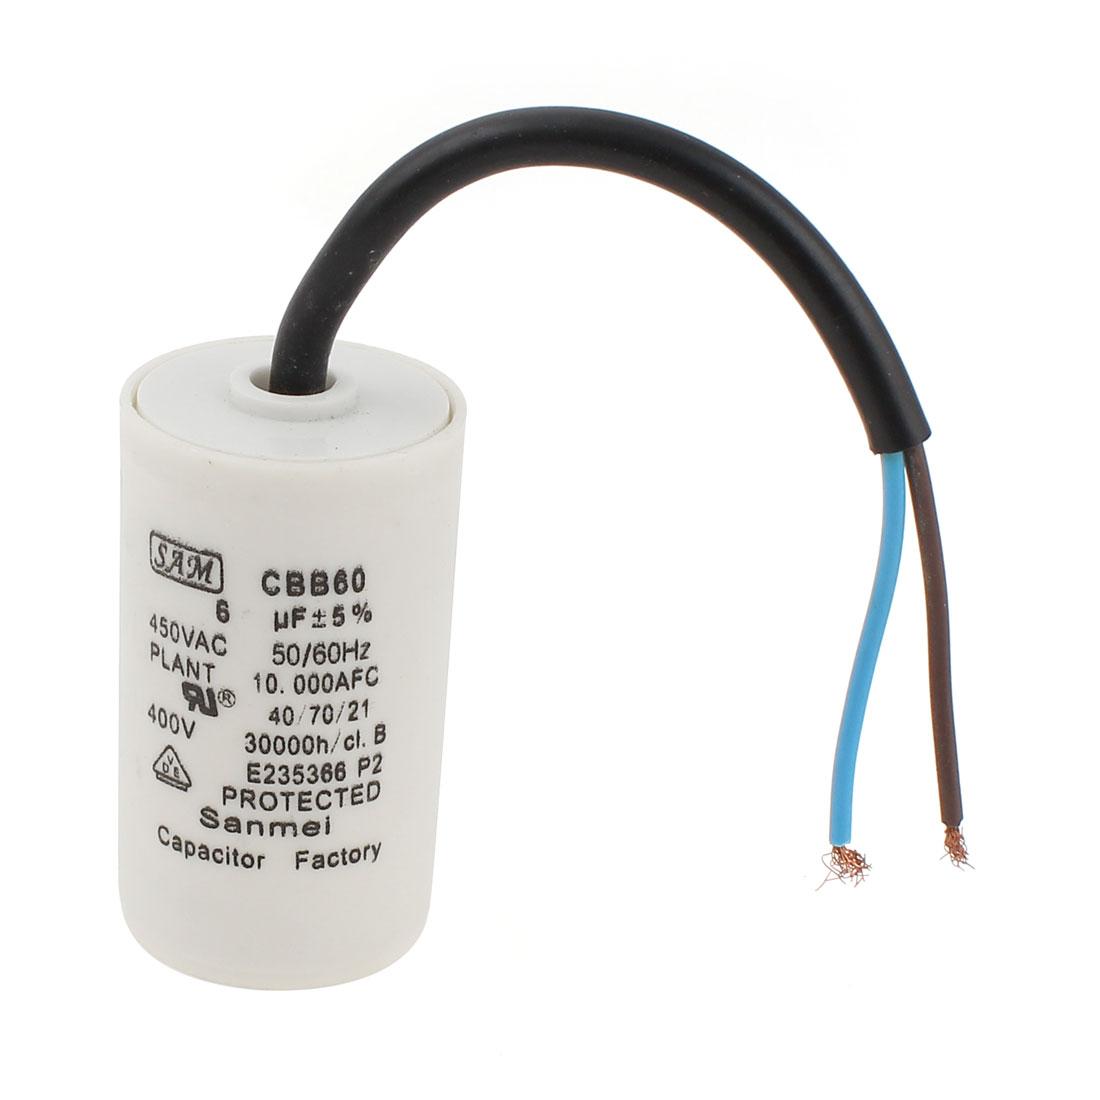 Polypropylene Film AC Motor Capacitor 6uF 450V CBB60 5% Tolerance